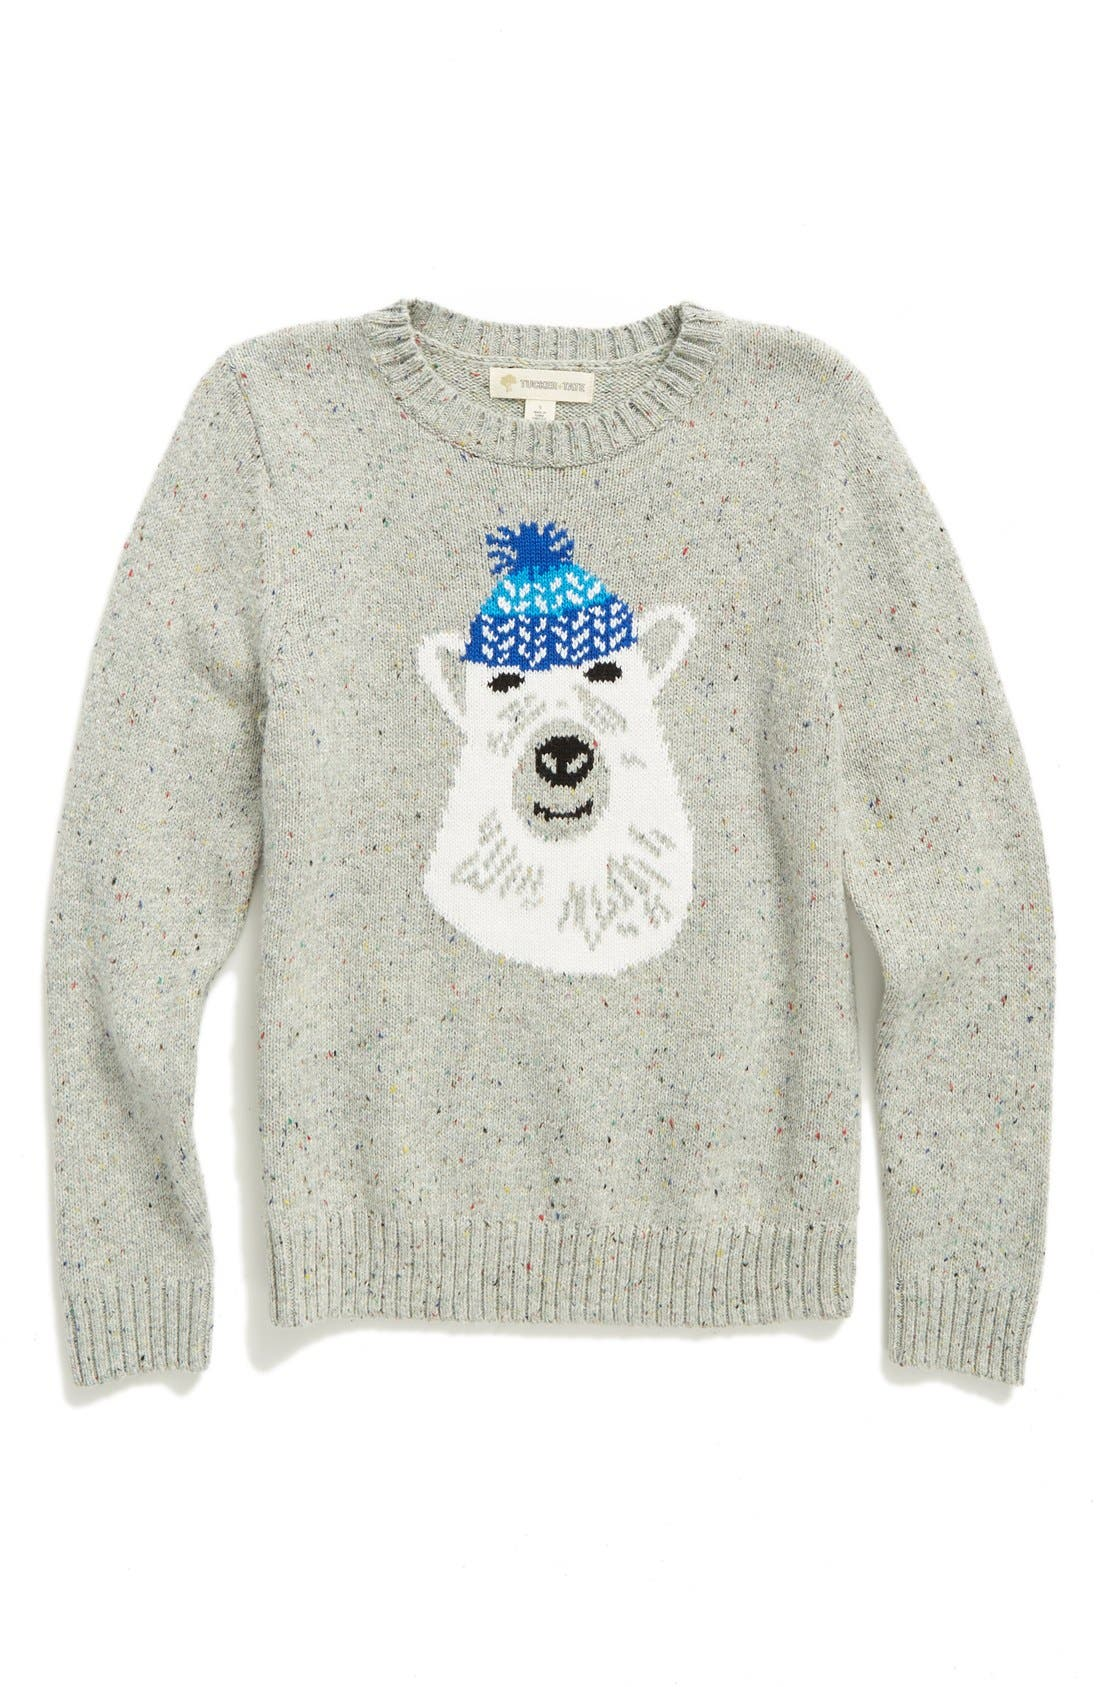 Main Image - Tucker + Tate Intarsia Knit Sweater (Little Boys)